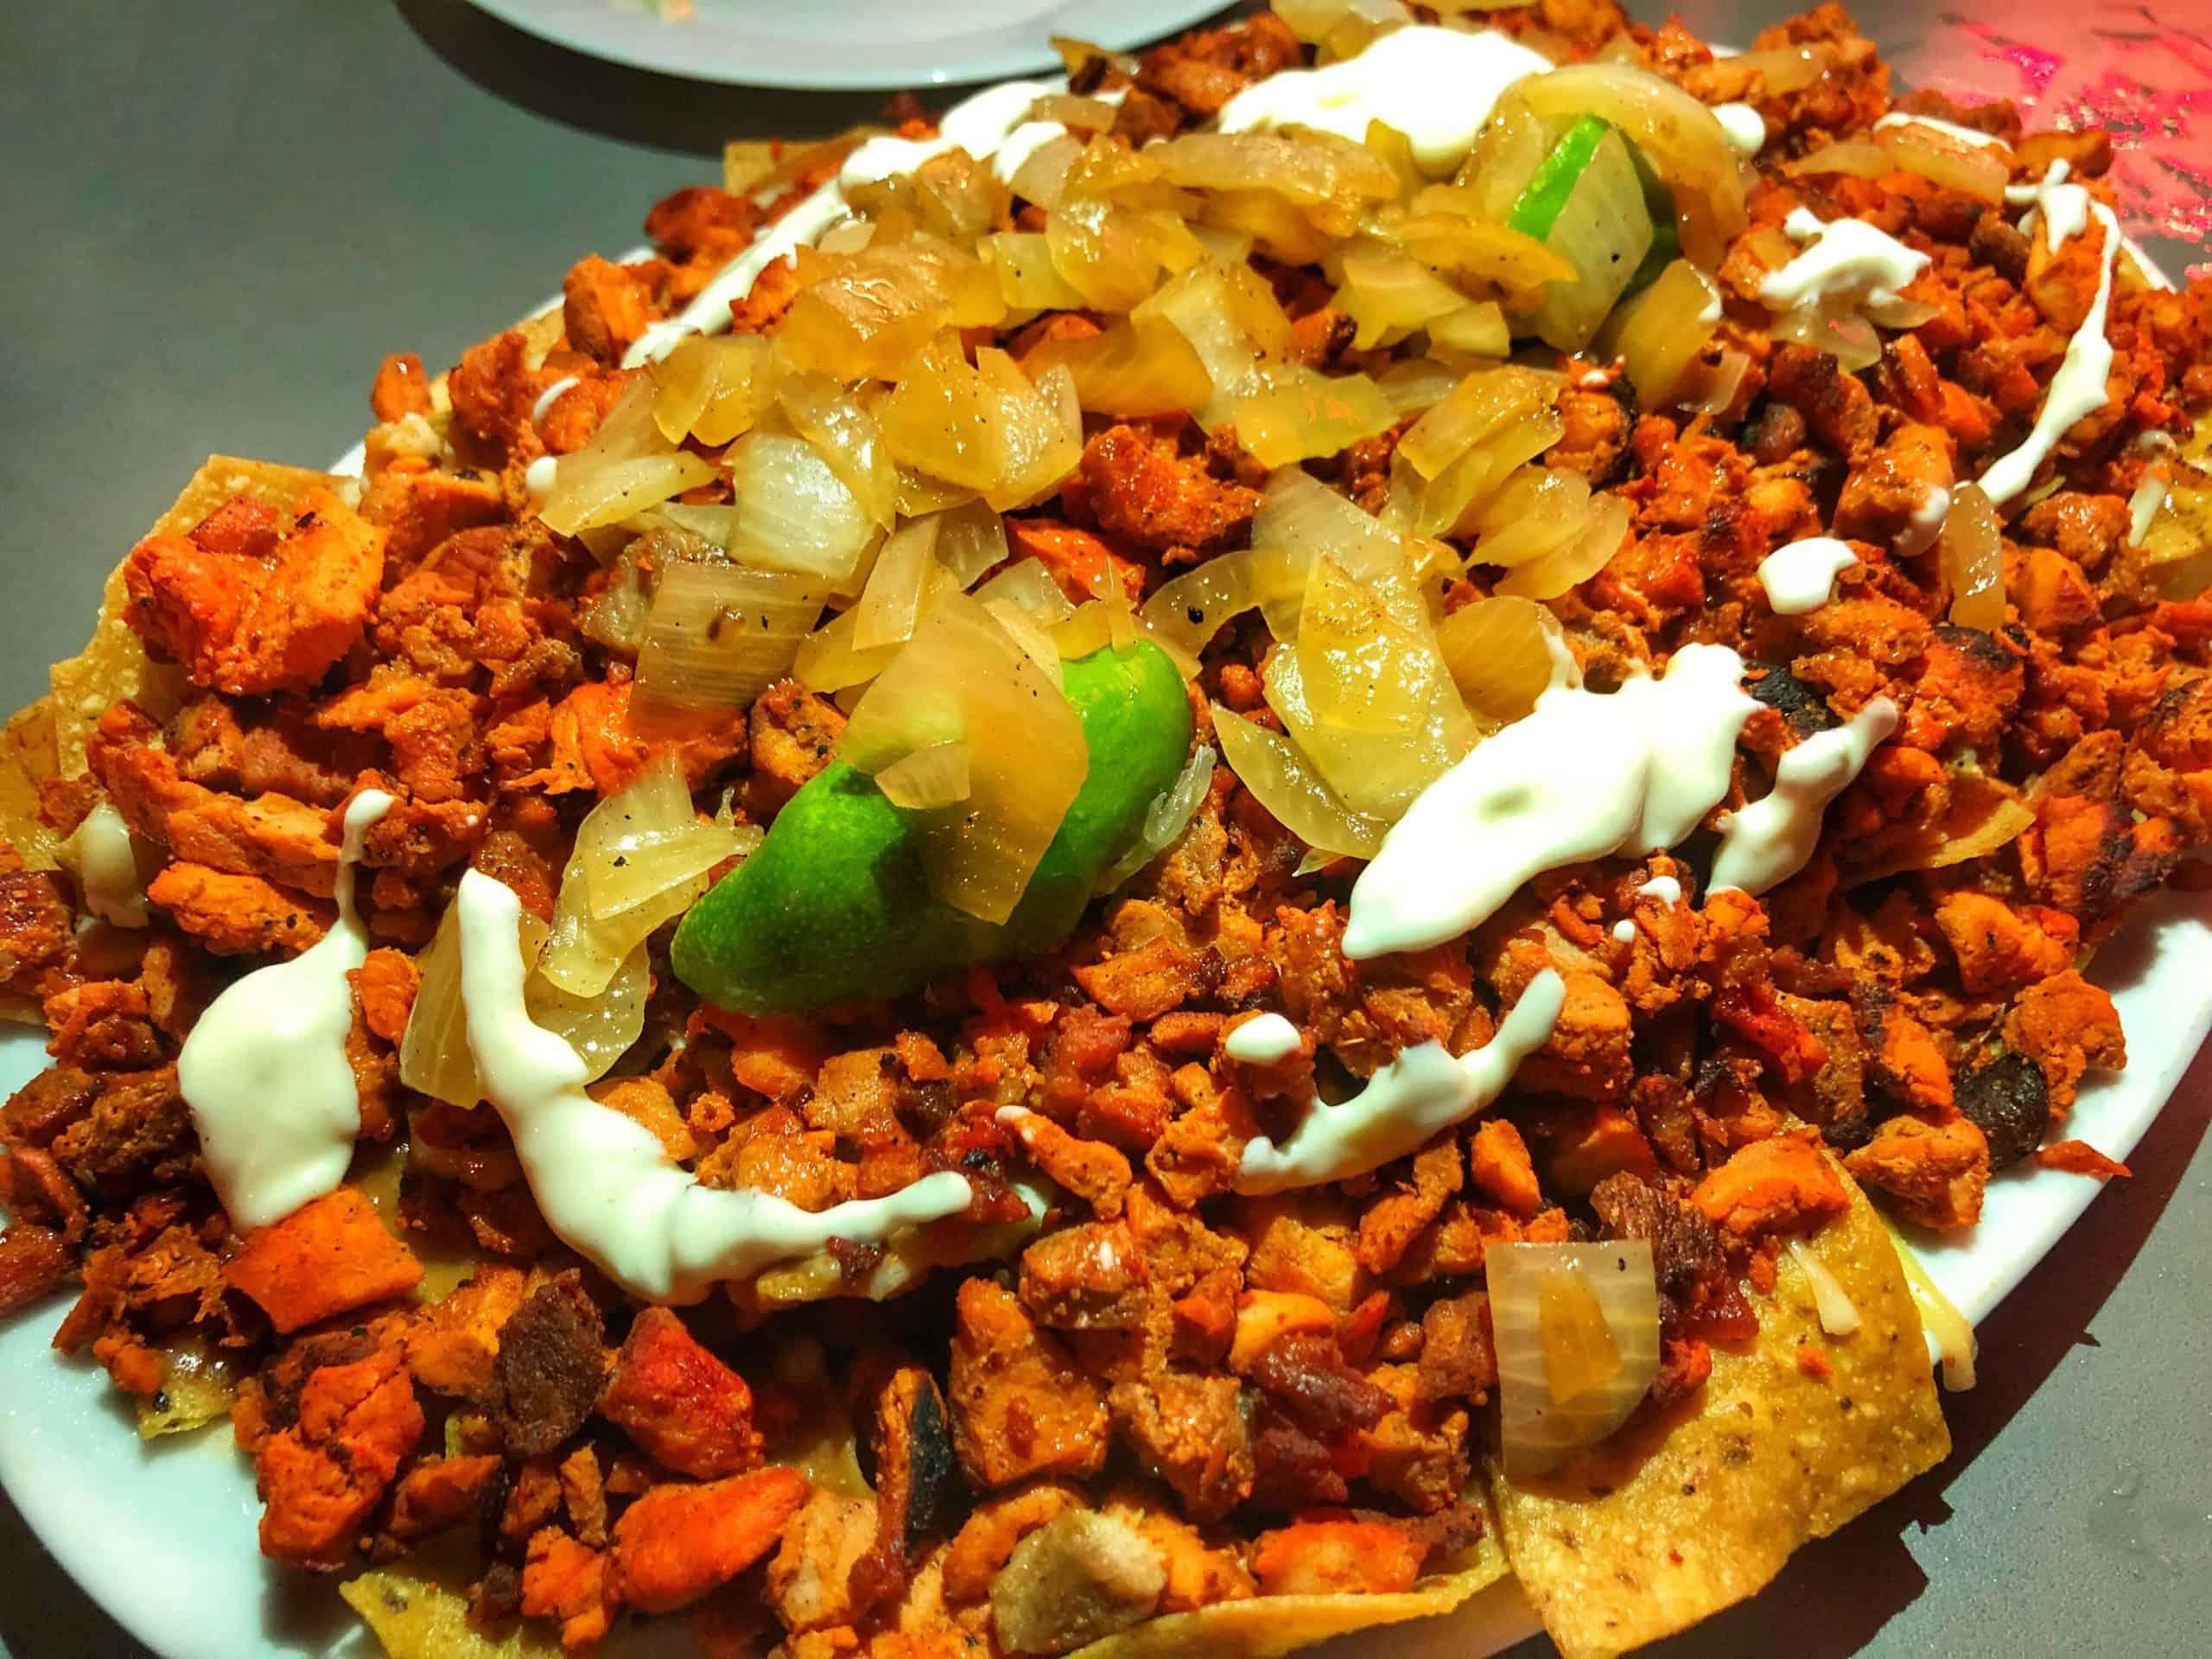 best Merida restaurants where to eat in Merida Mexico